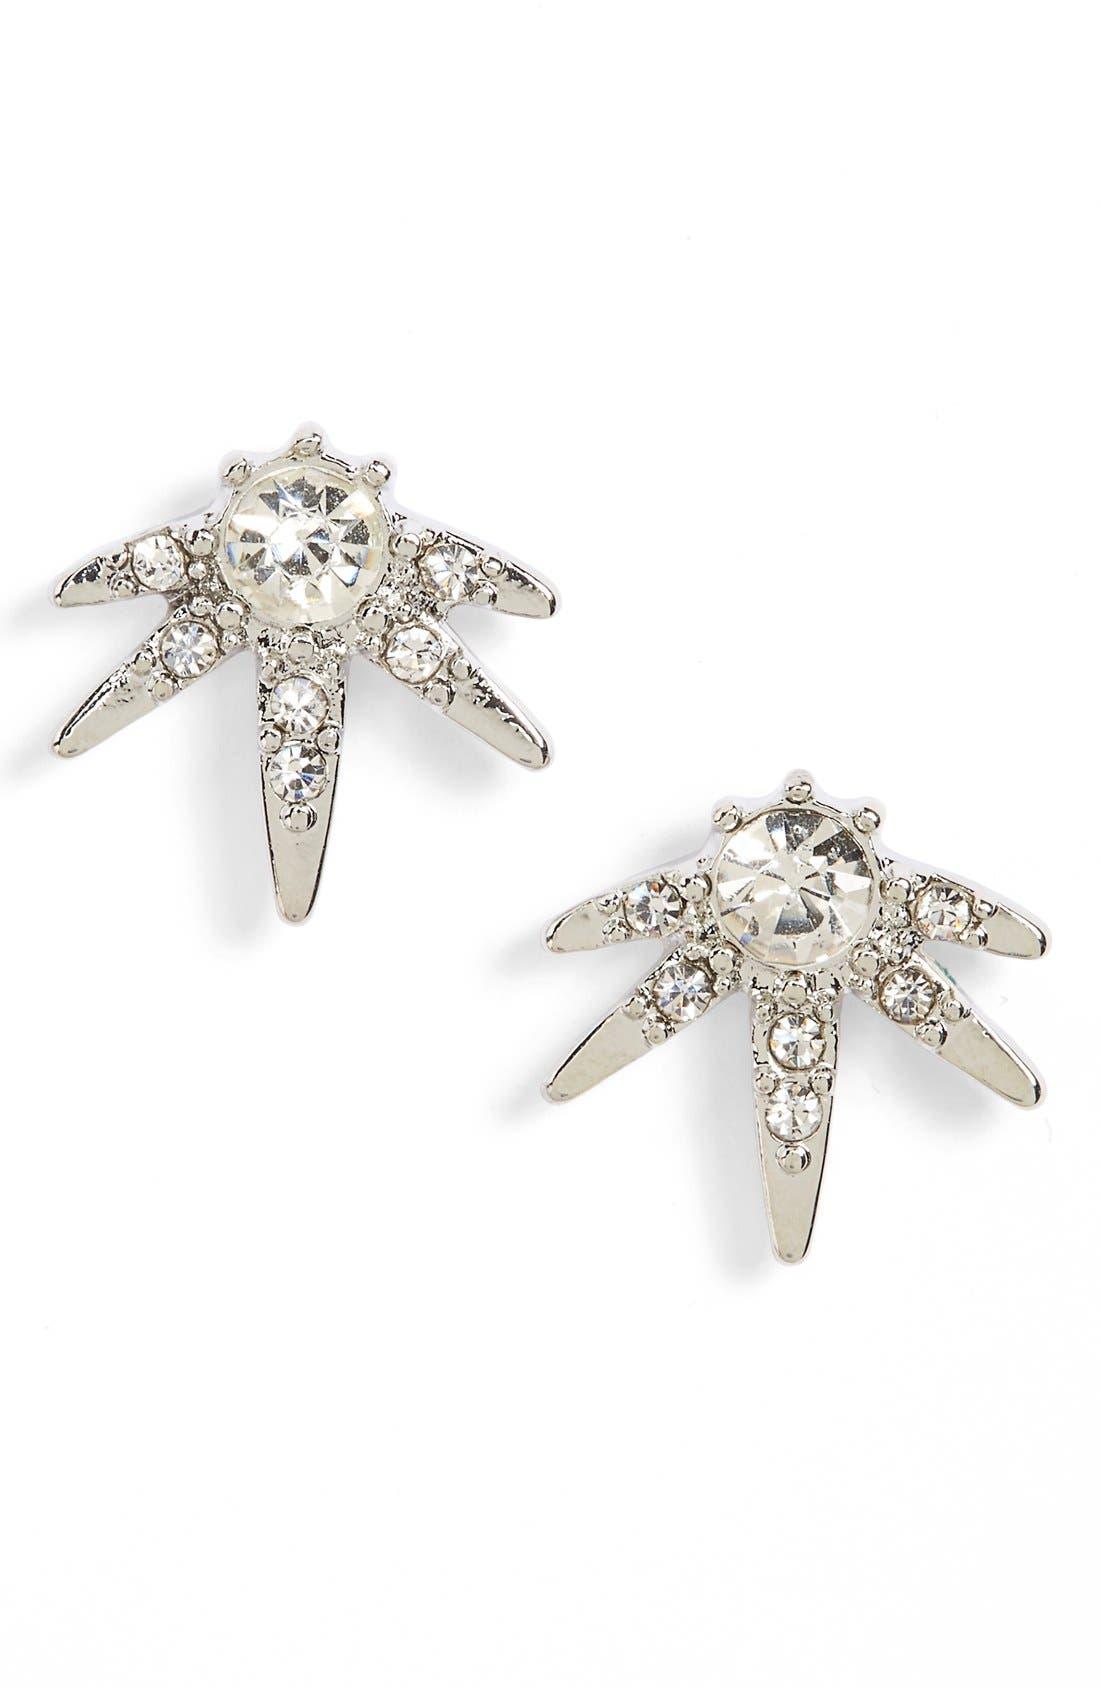 Main Image - Sole Society Crystal Starburst Stud Earrings